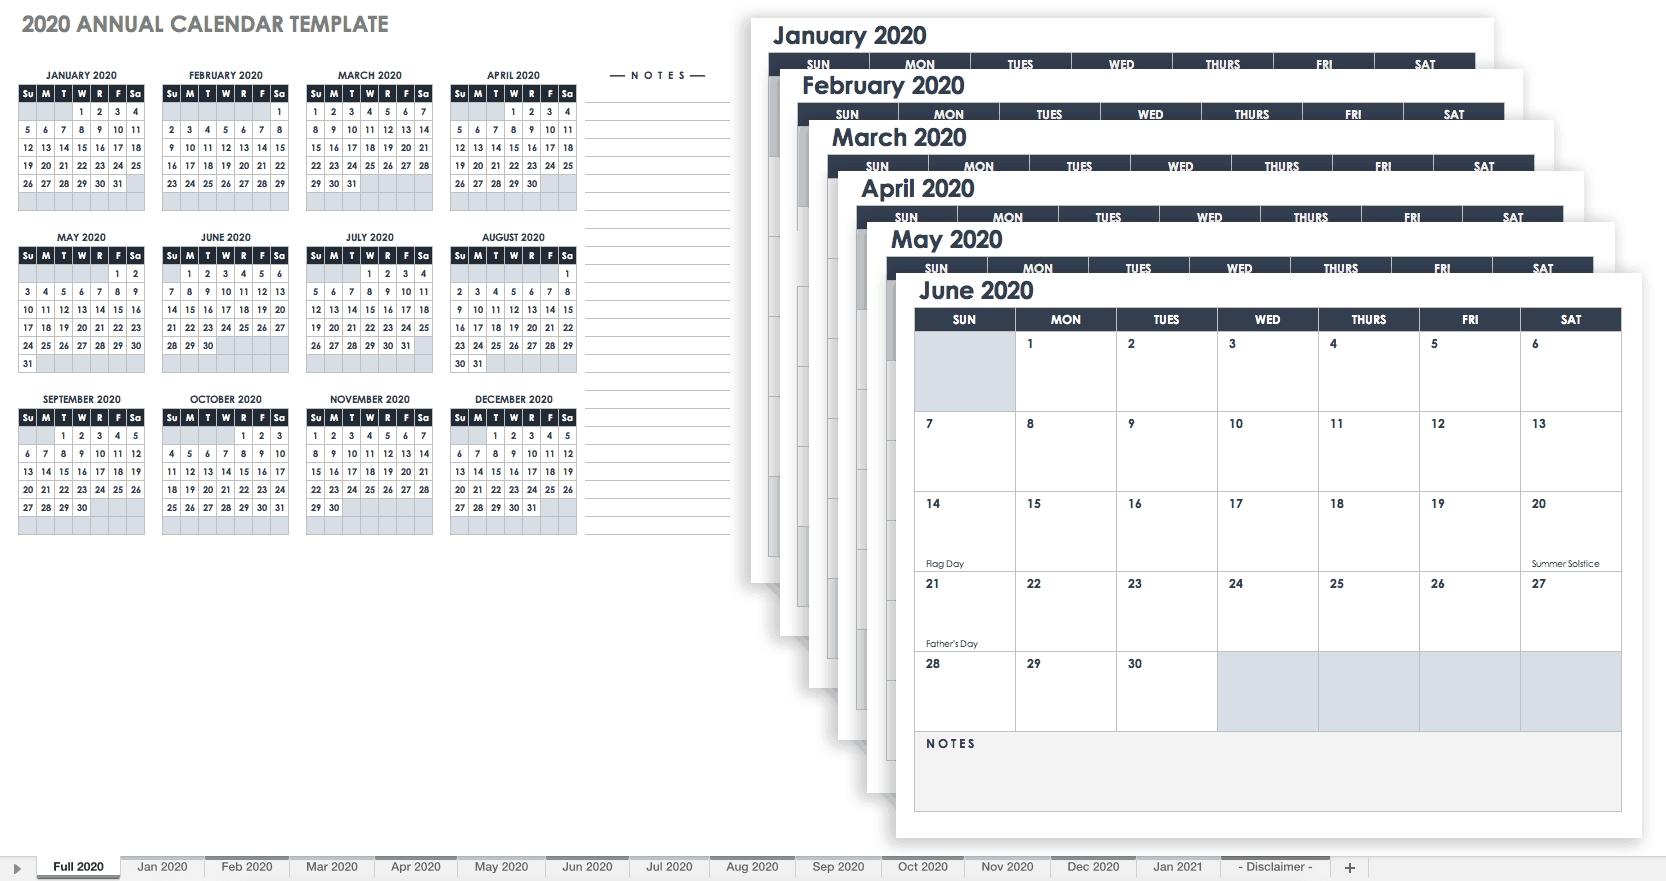 Free Blank Calendar Templates - Smartsheet-Staff Calendar Template 2020